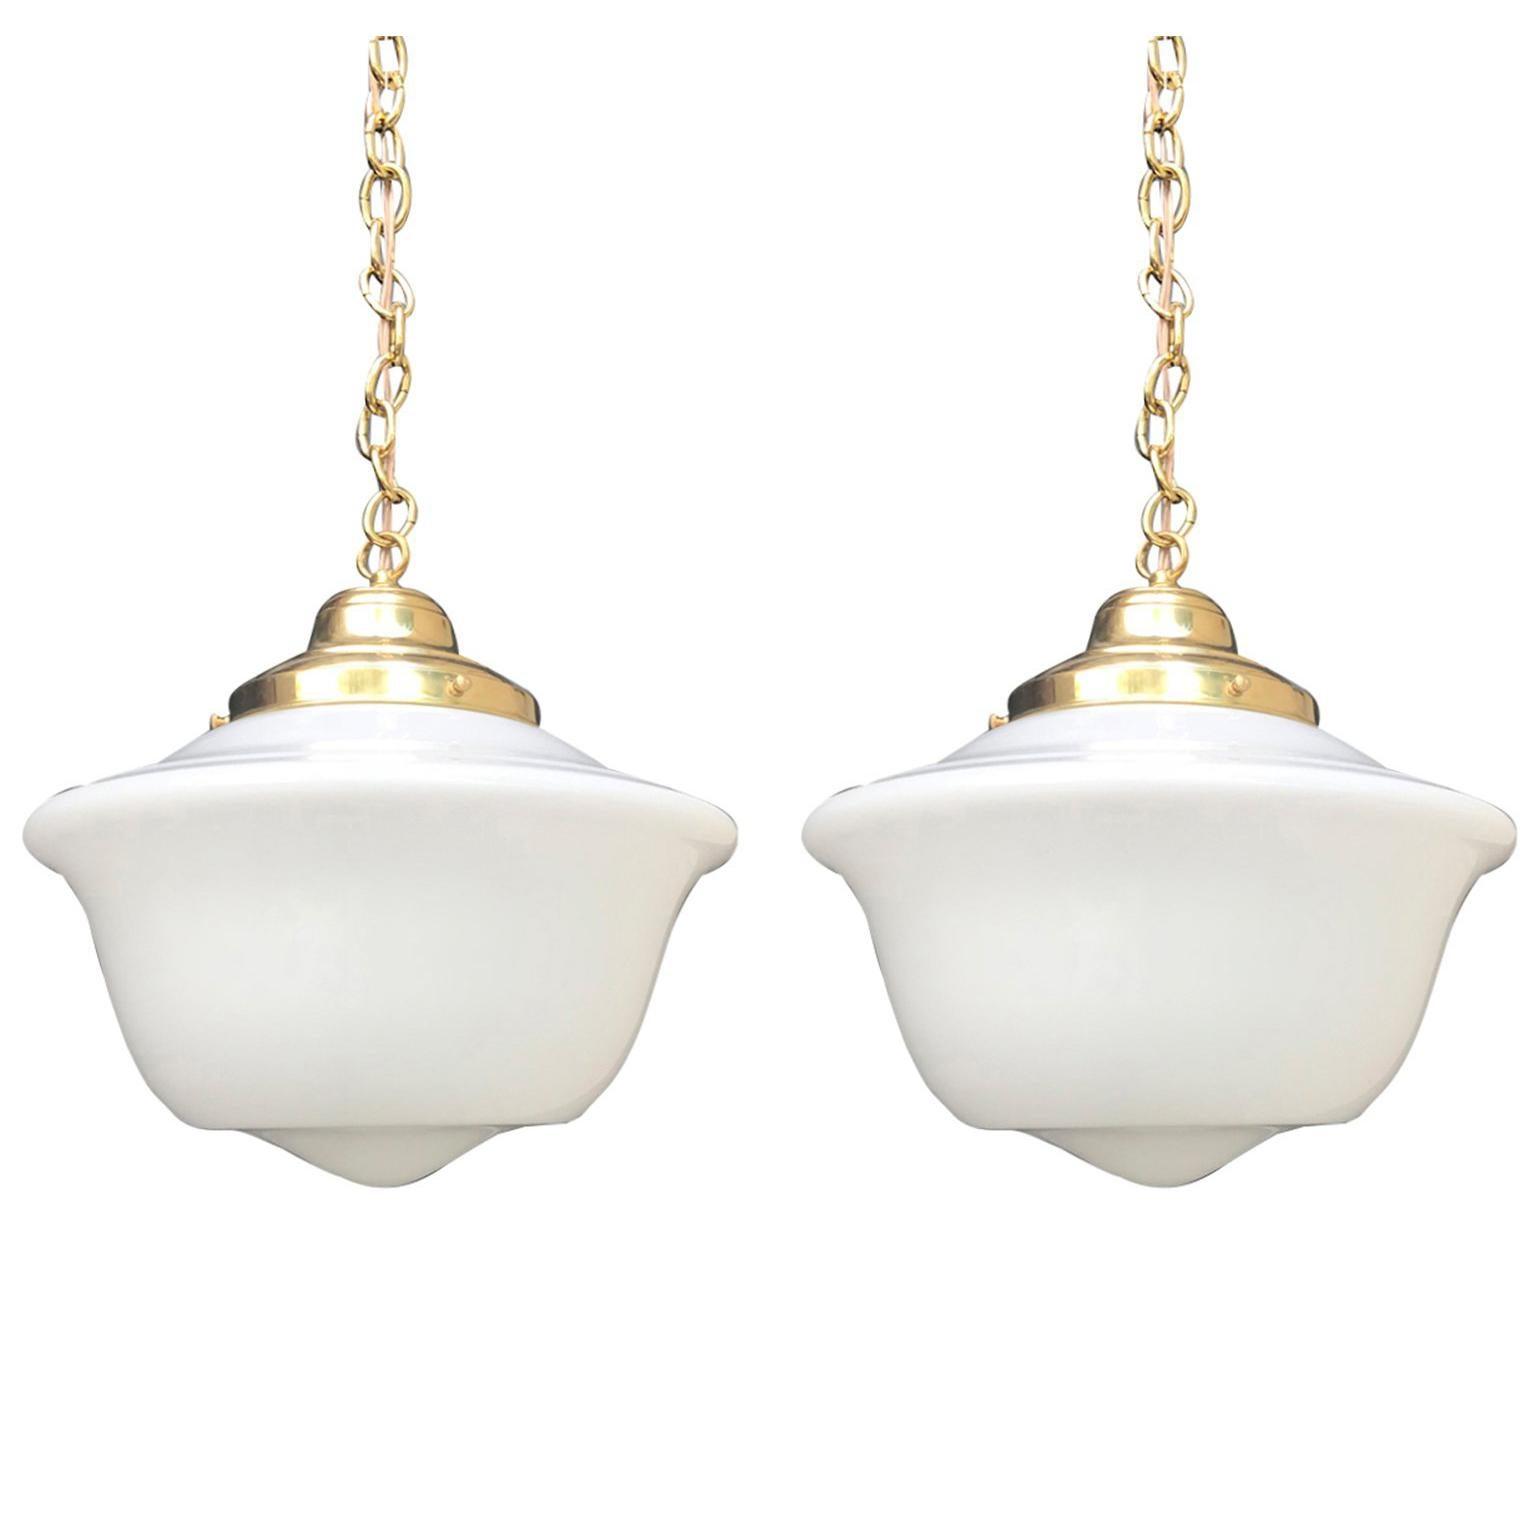 Pair of 20th Century American Milk Glass Pendant & Brass Hanging Light Fixtures